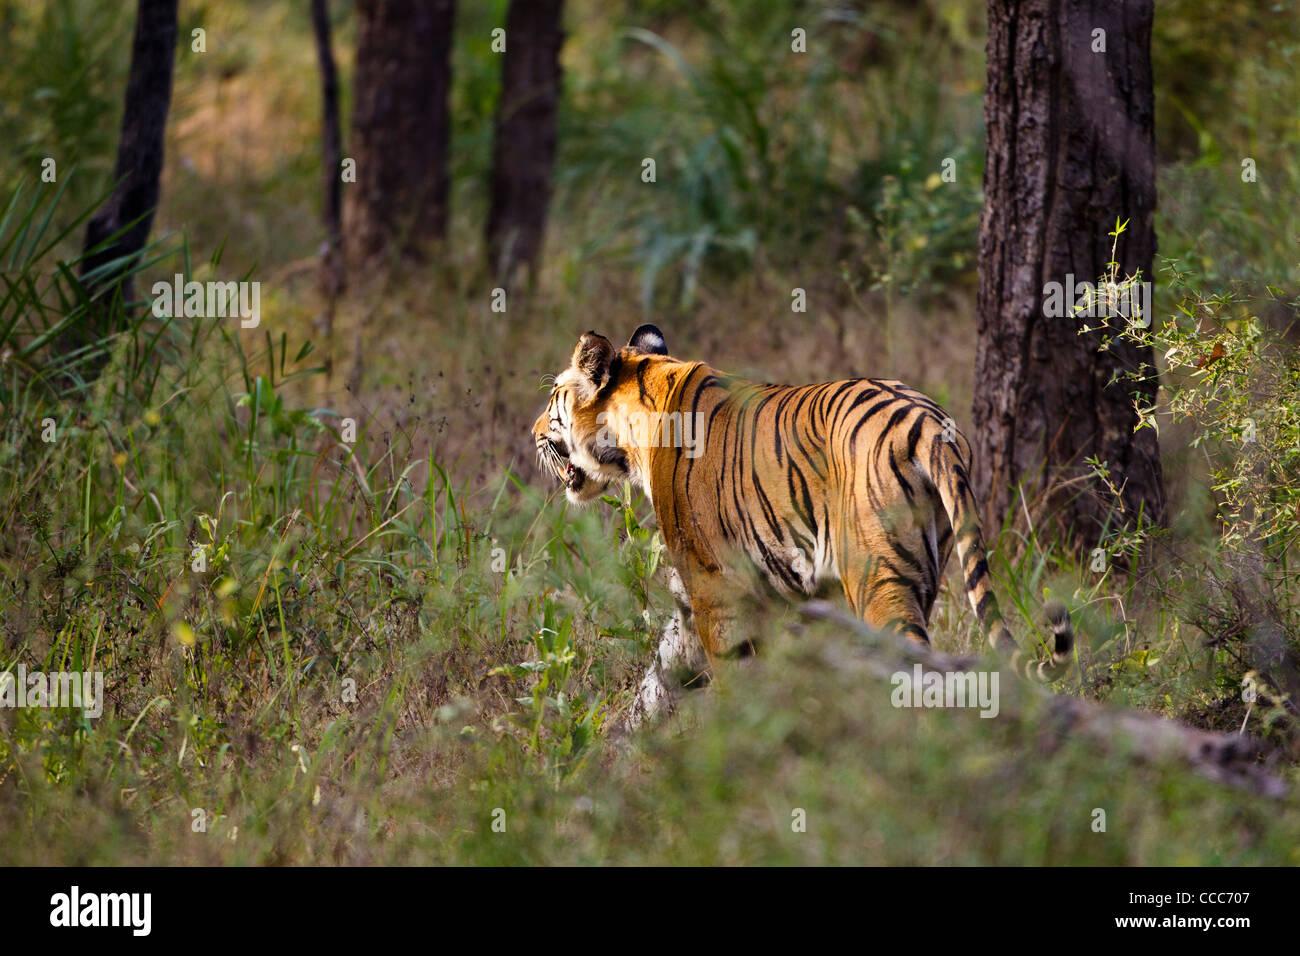 Bengal tiger in Bandhavgarh National Park, India. - Stock Image